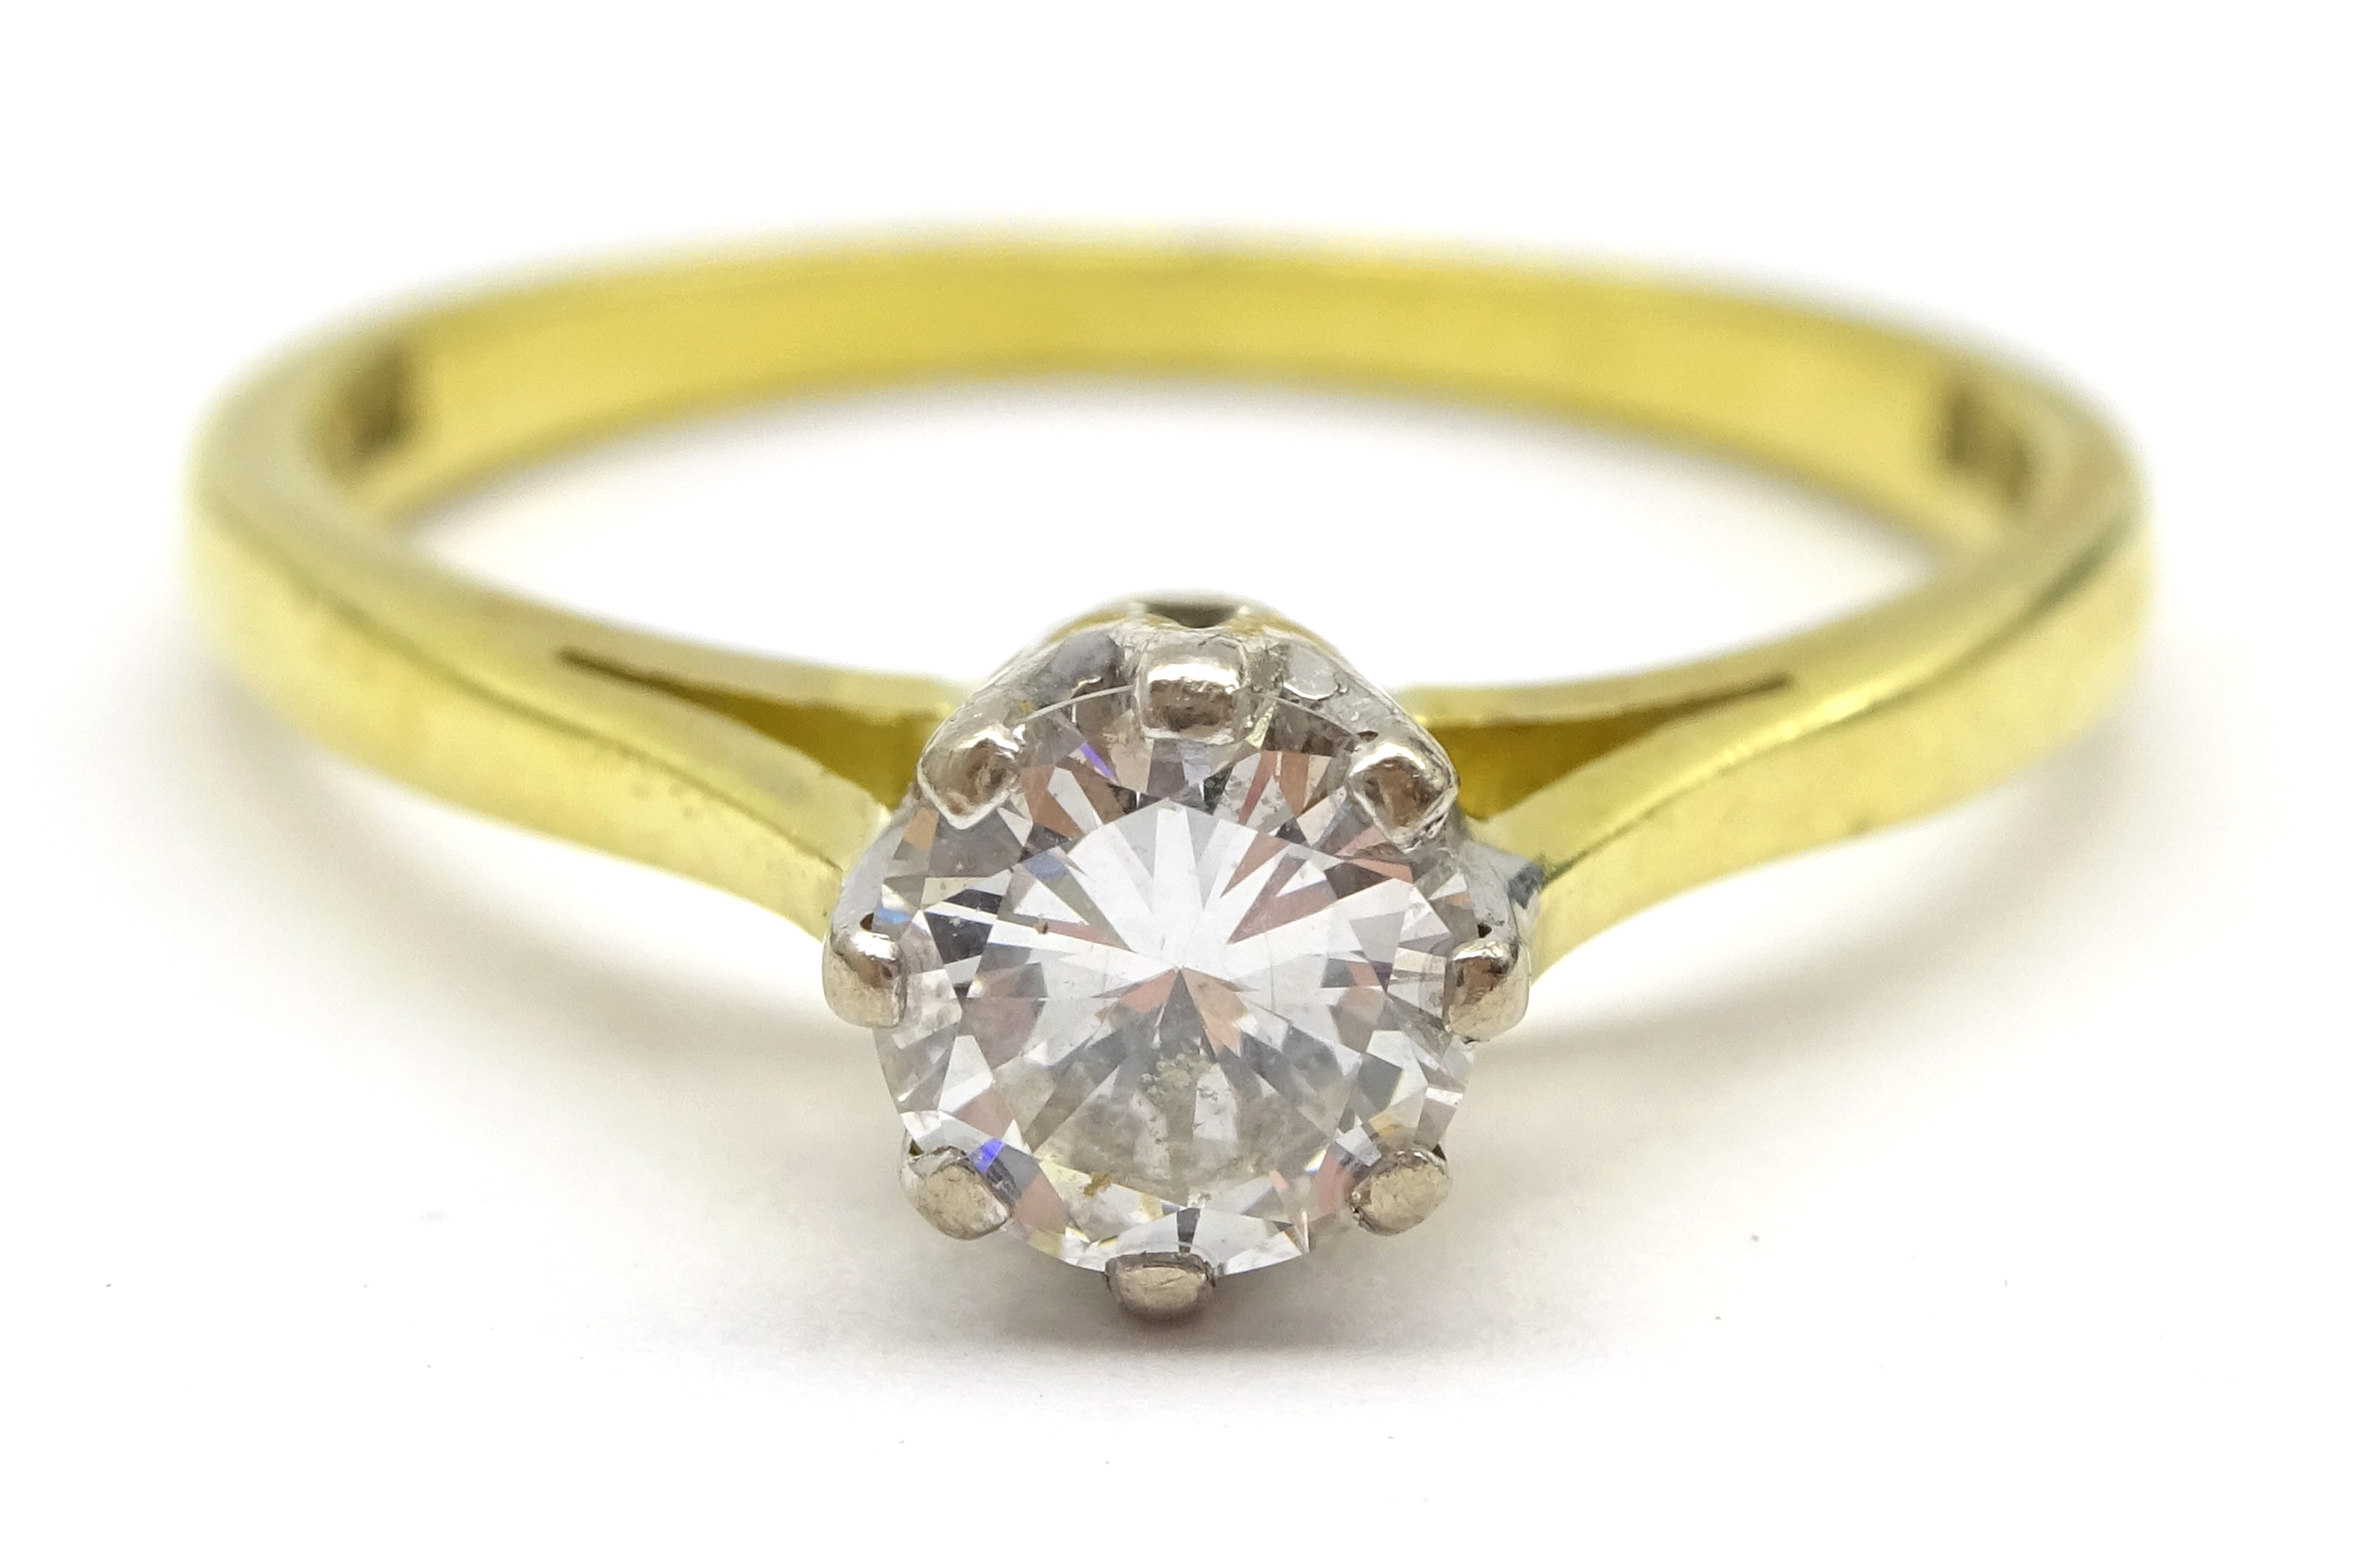 Lot 1010 - 18ct gold single stone diamond ring hallmarked, diamond approx 0.